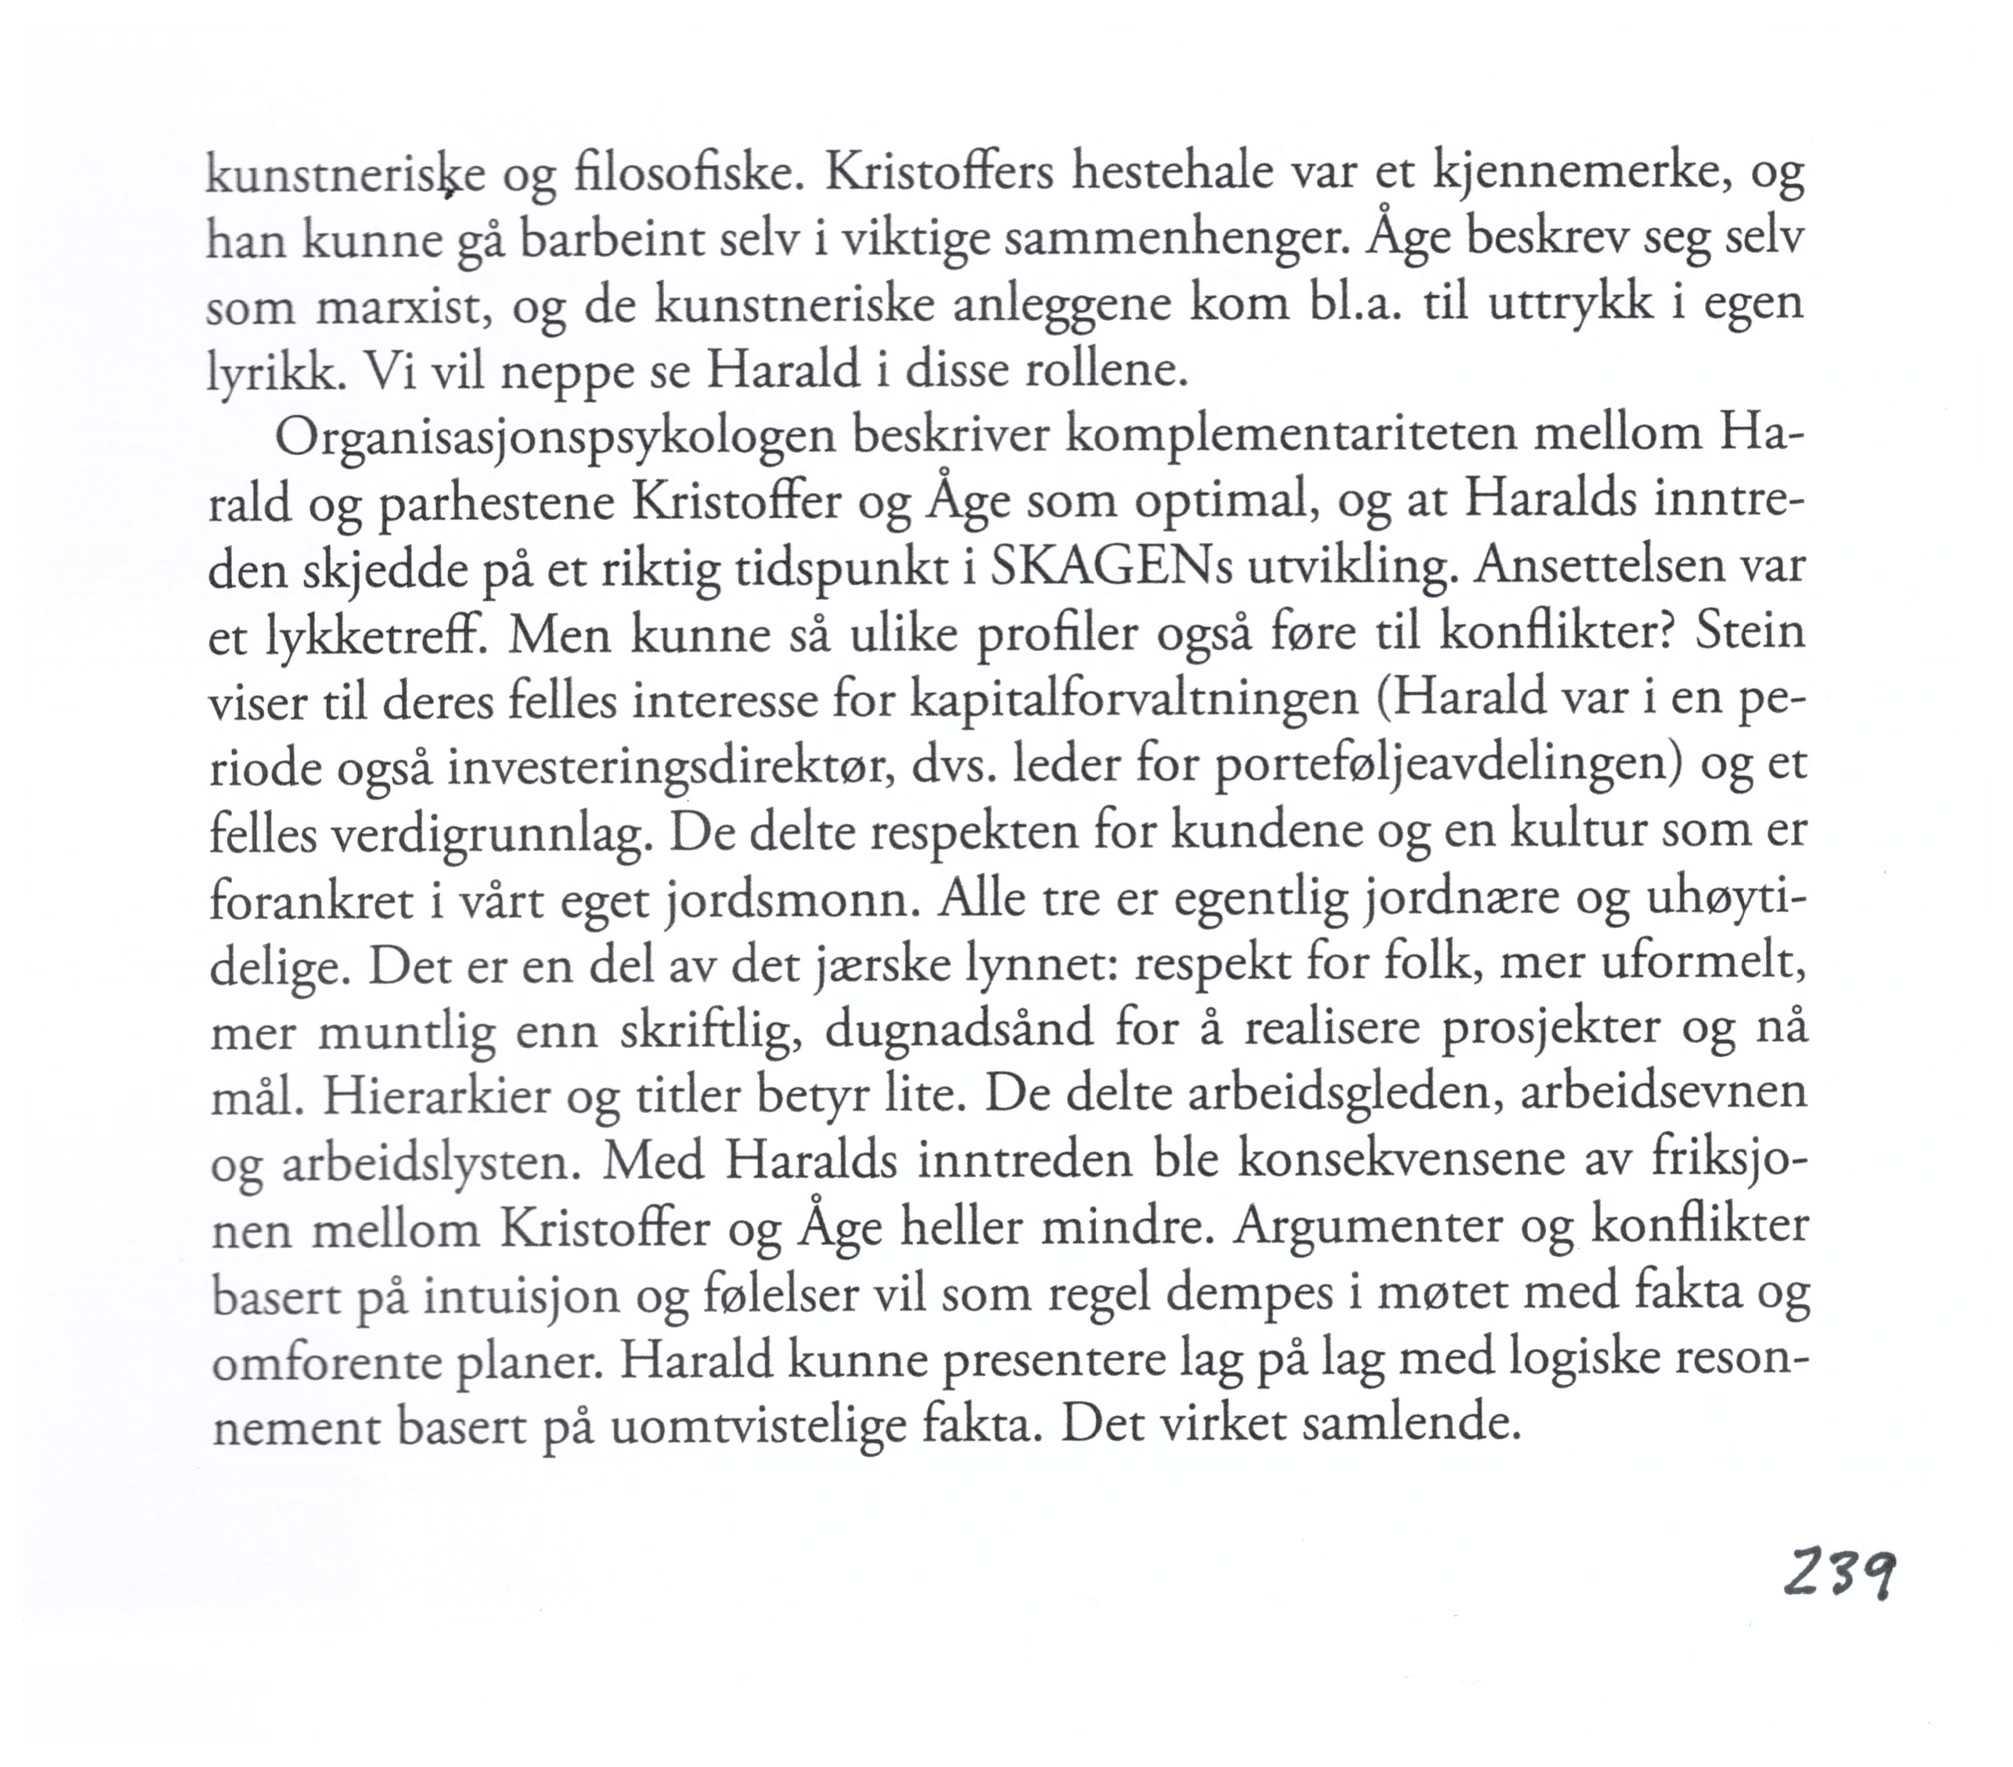 Skagen boka 4